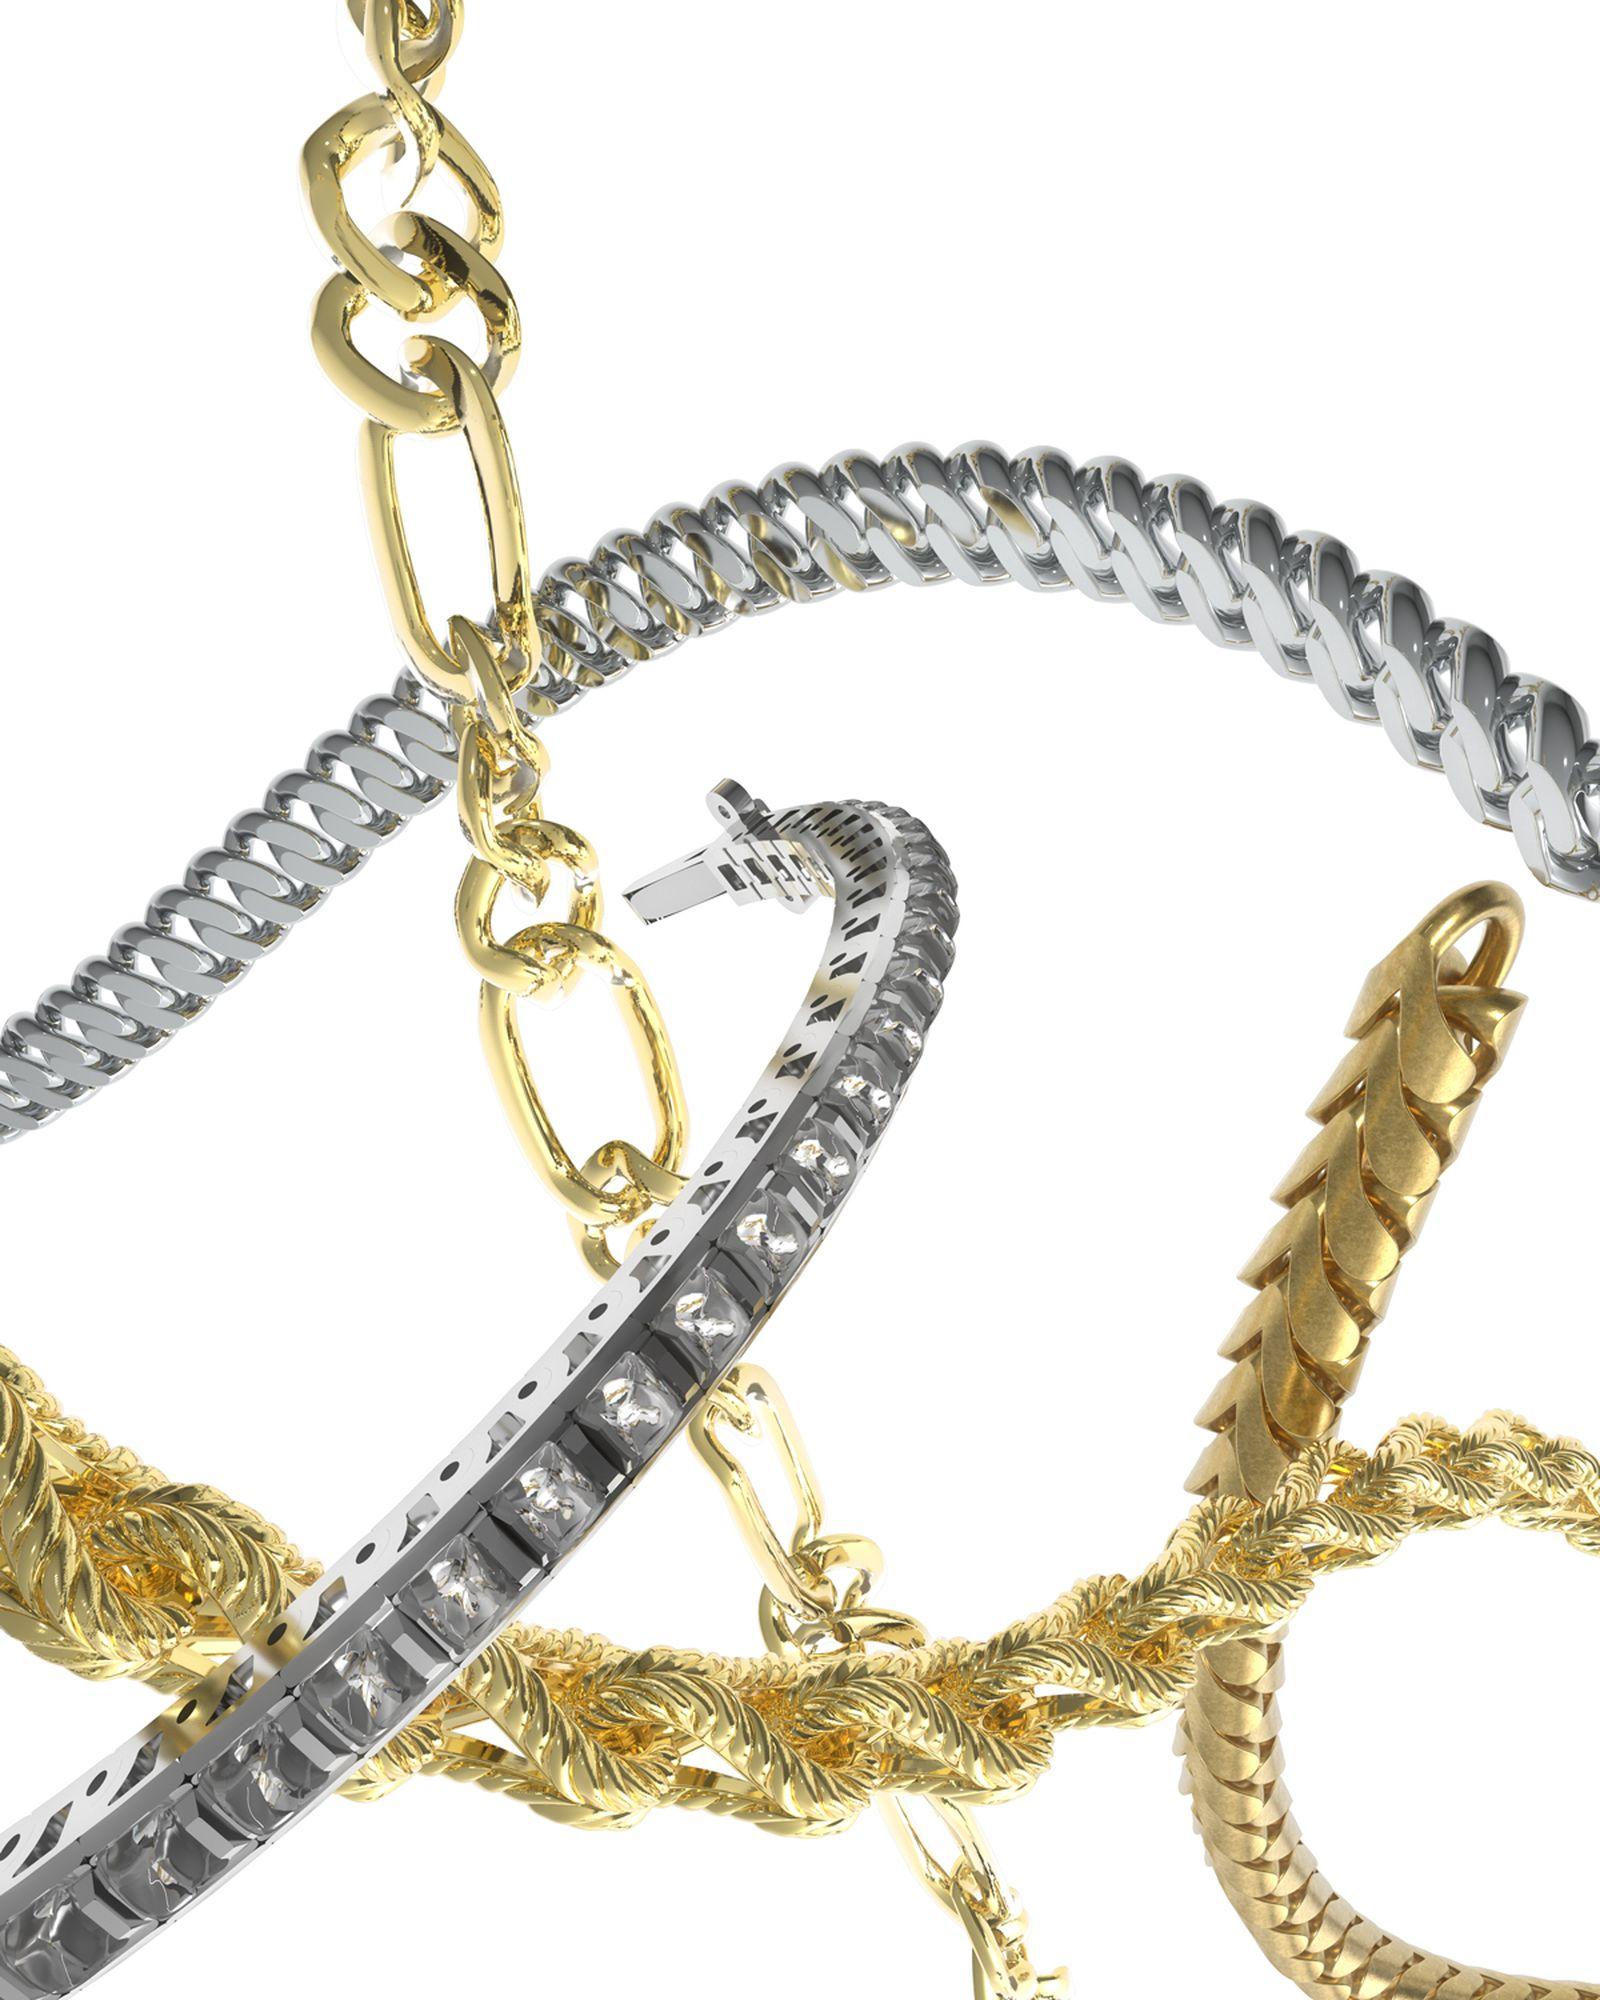 asap-eva-chains-guide-1